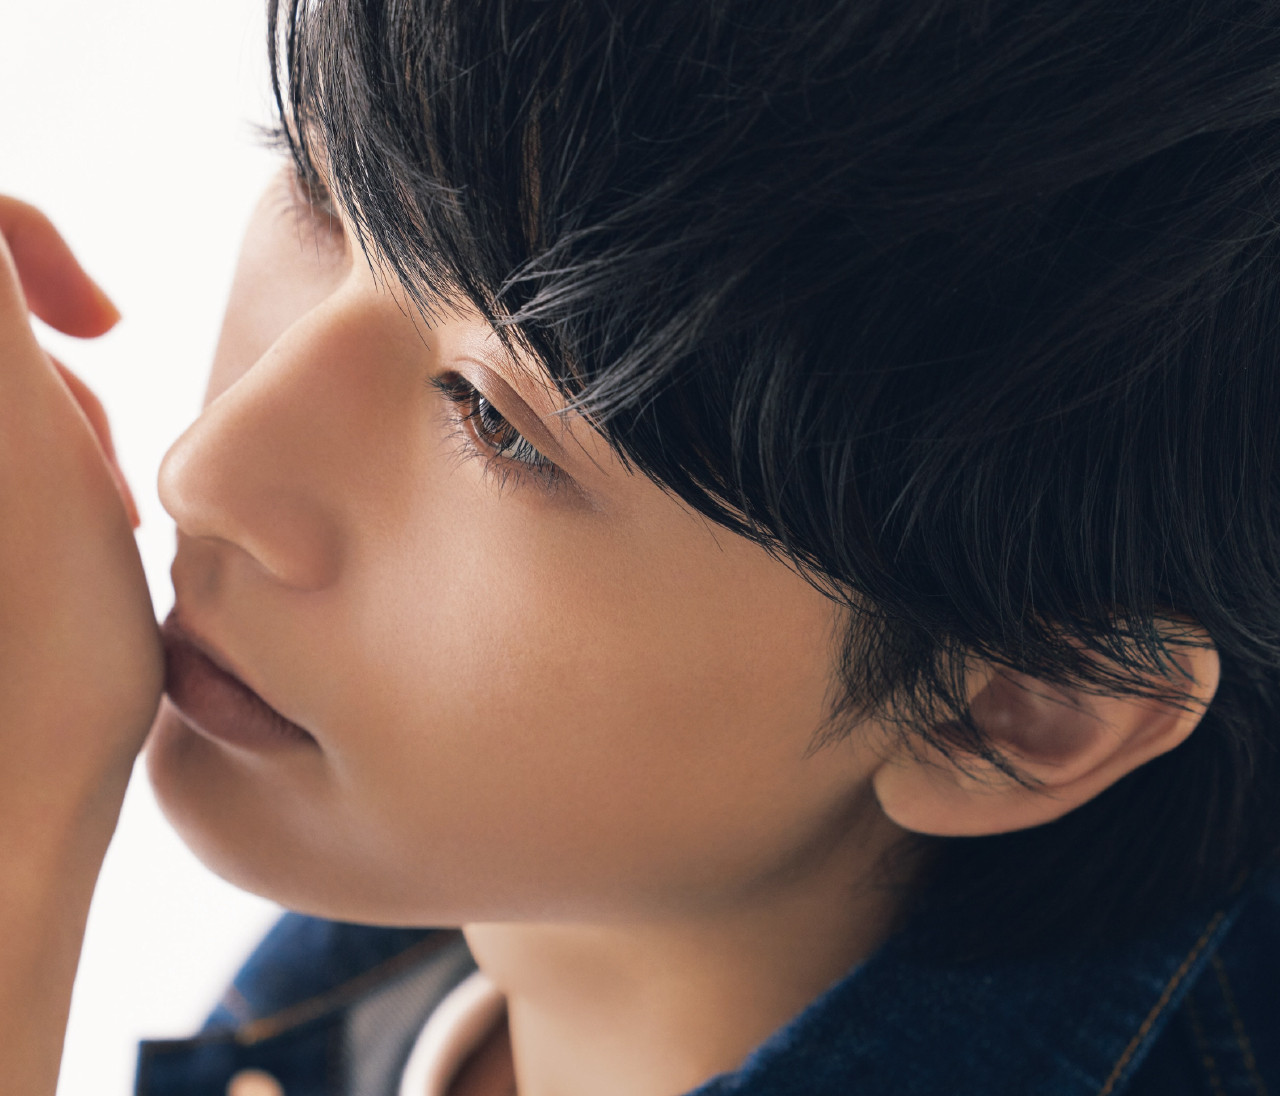 【DIOR BEAUTY】吉沢 亮 自信をくれる香りと肌